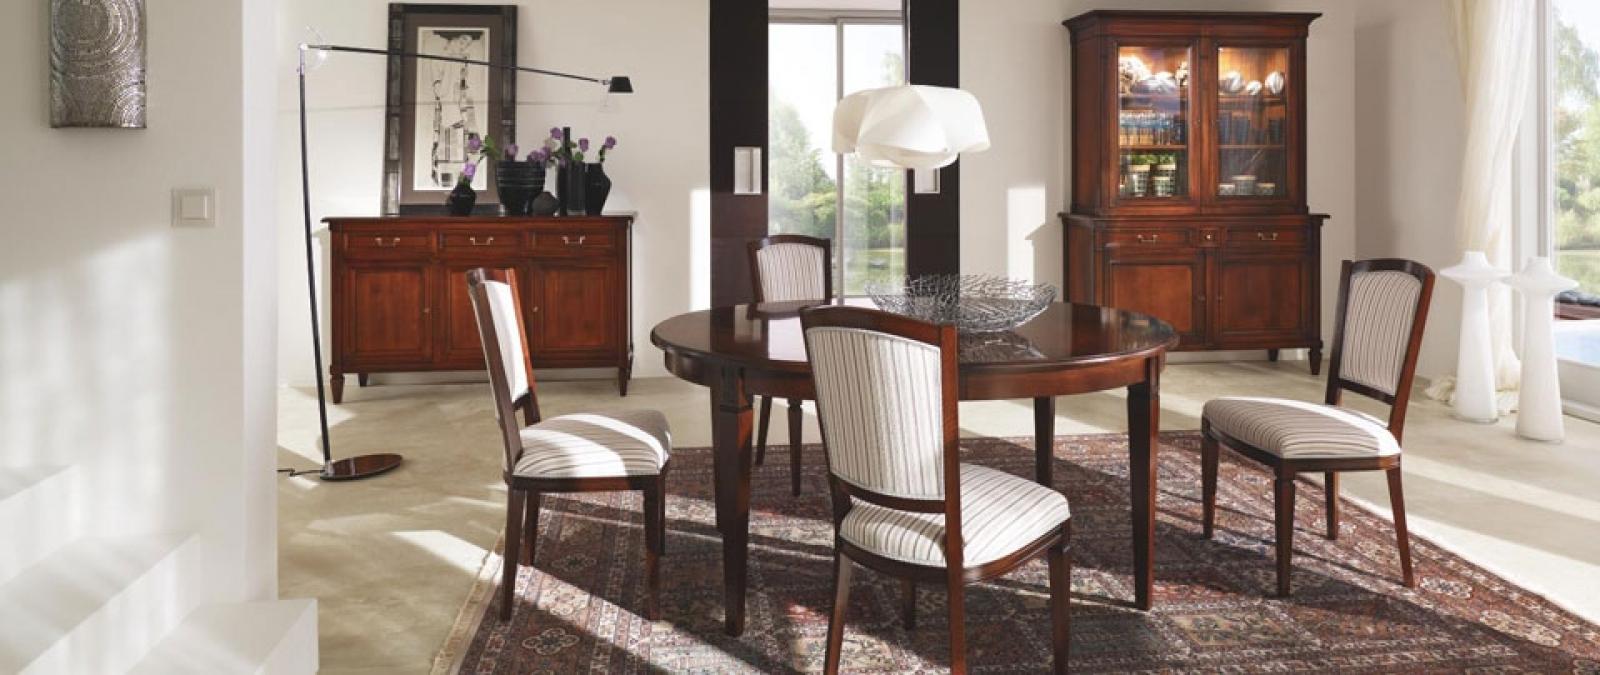 John Dick & Son Fine Furniture (View 9 of 25)